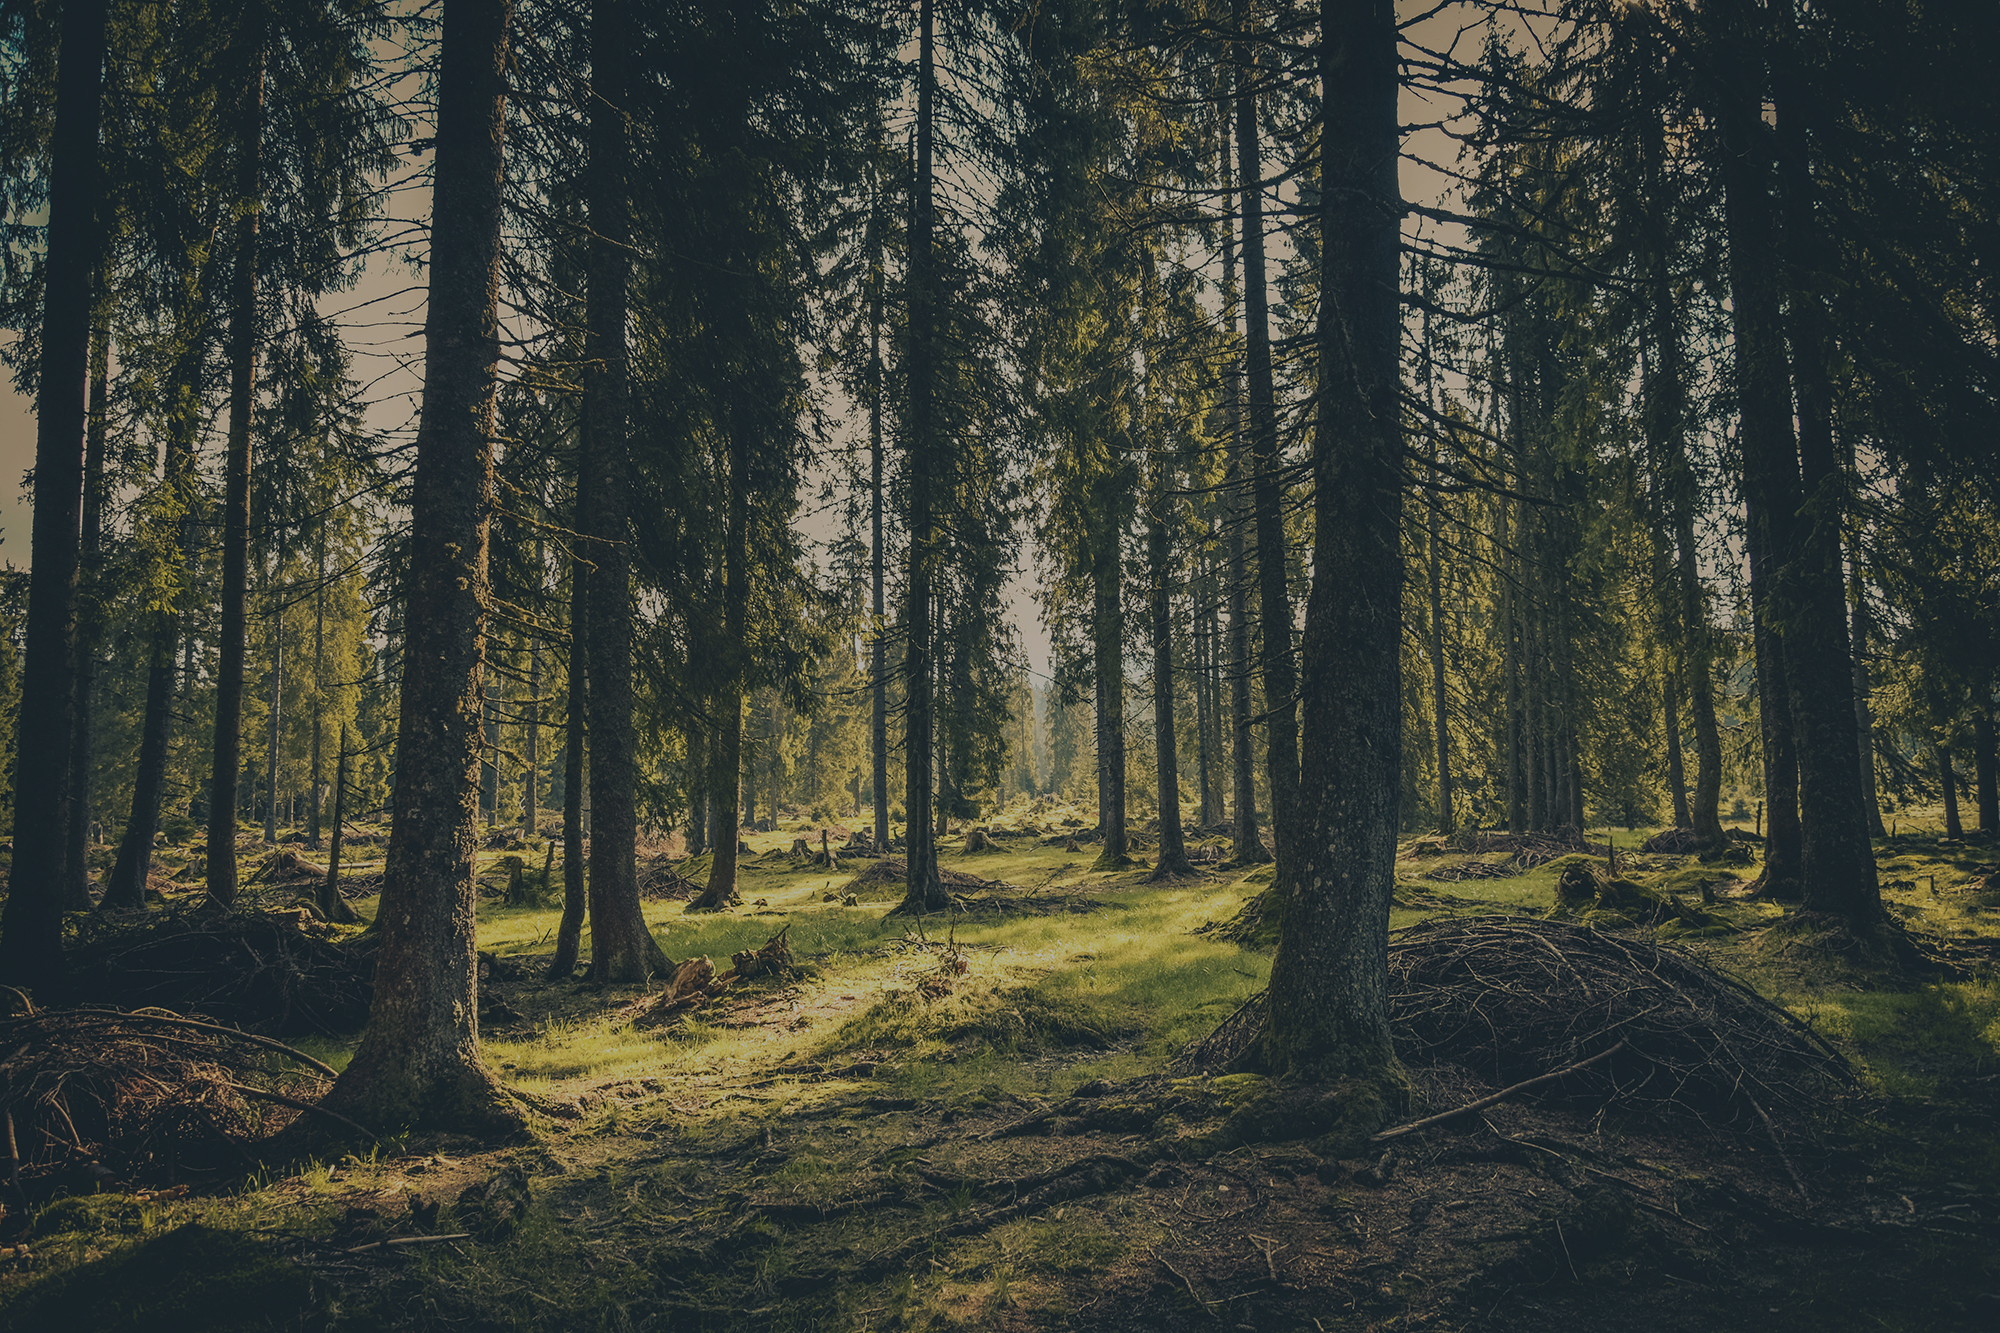 Tree Care in Wiltshire, Berkshire, Hampshire